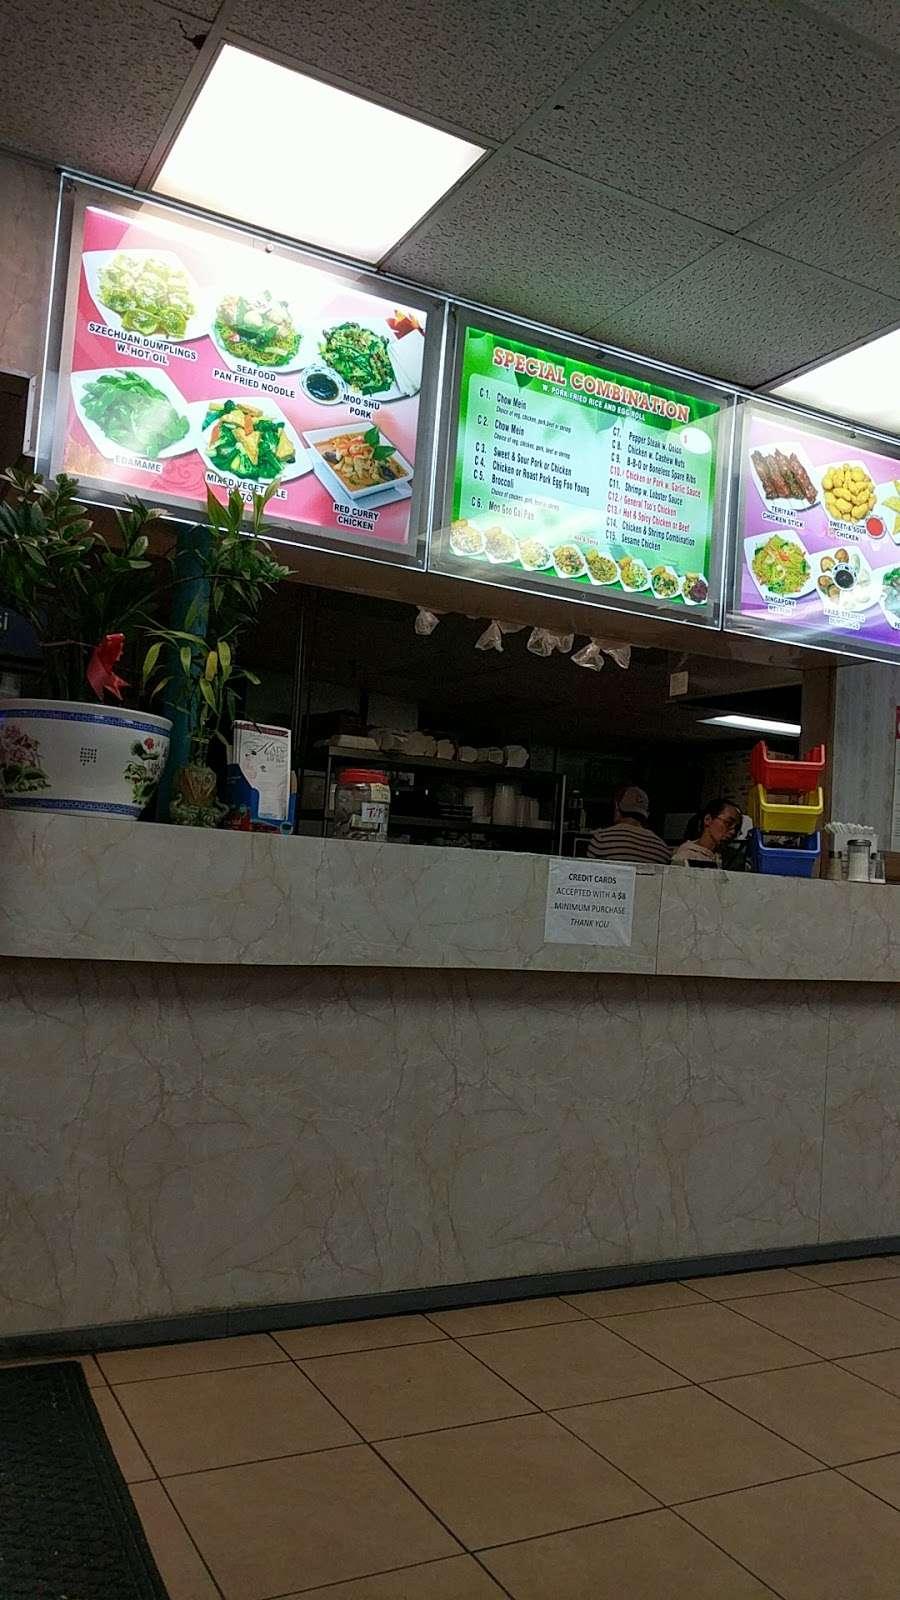 Kais Chinese Kitchen - restaurant    Photo 9 of 10   Address: 145 NY-22, Pawling, NY 12564, USA   Phone: (845) 289-0468